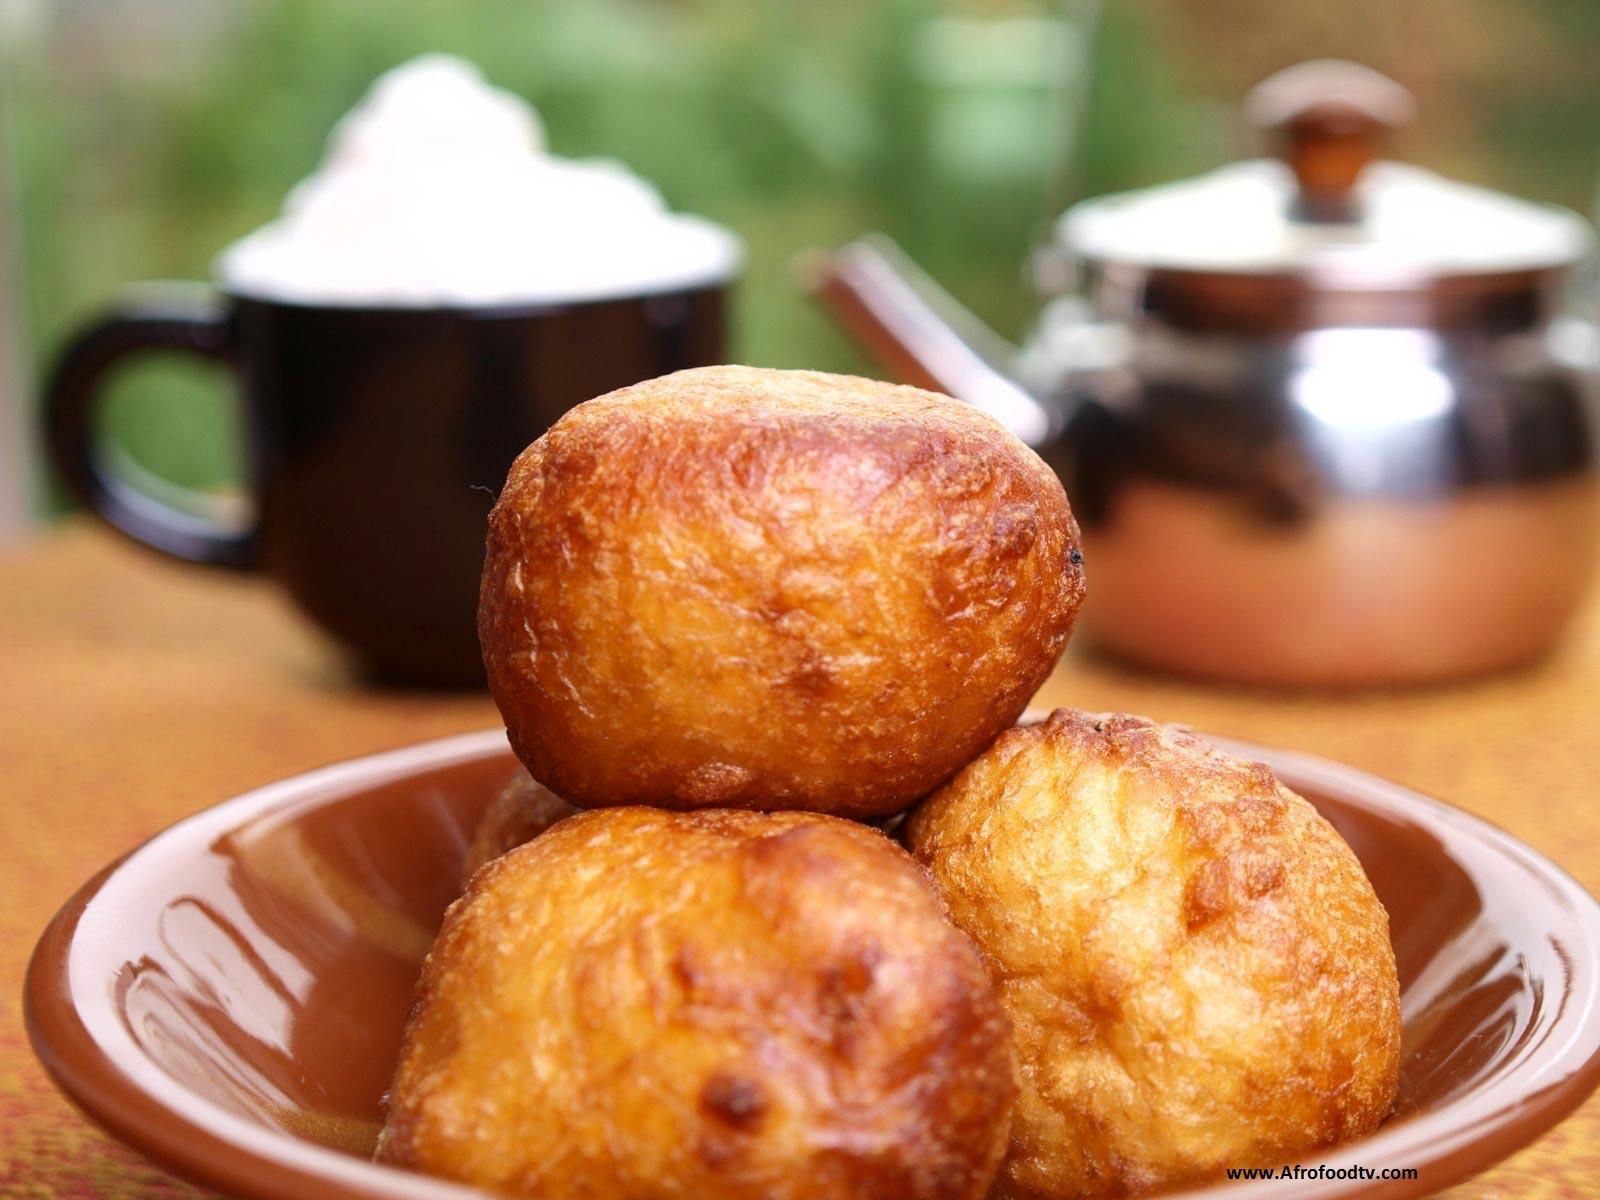 puff-puff-Afro-Food-TV